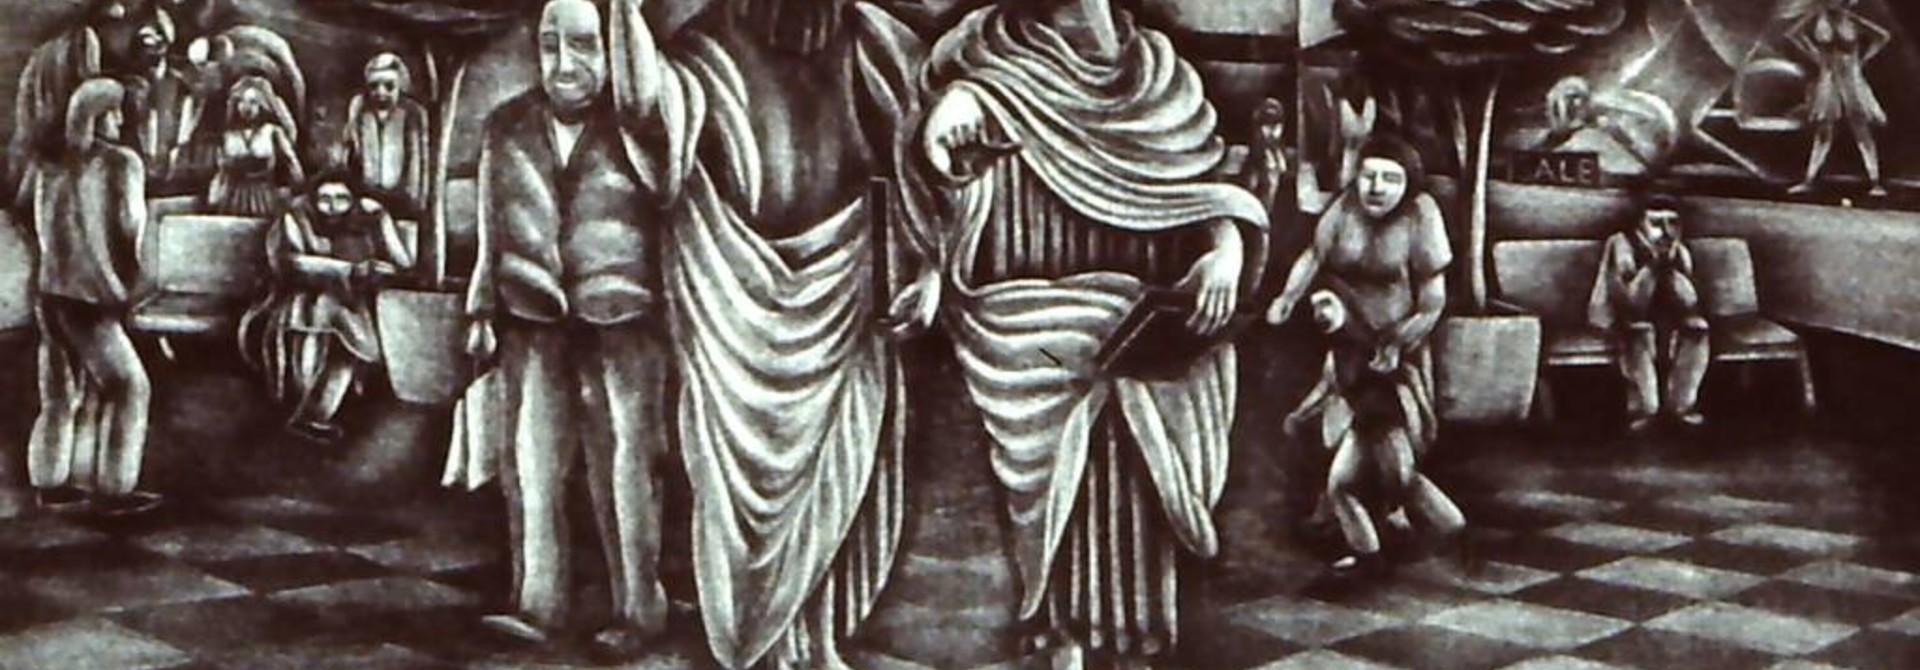 Plato and Aristotle Visit the Mall